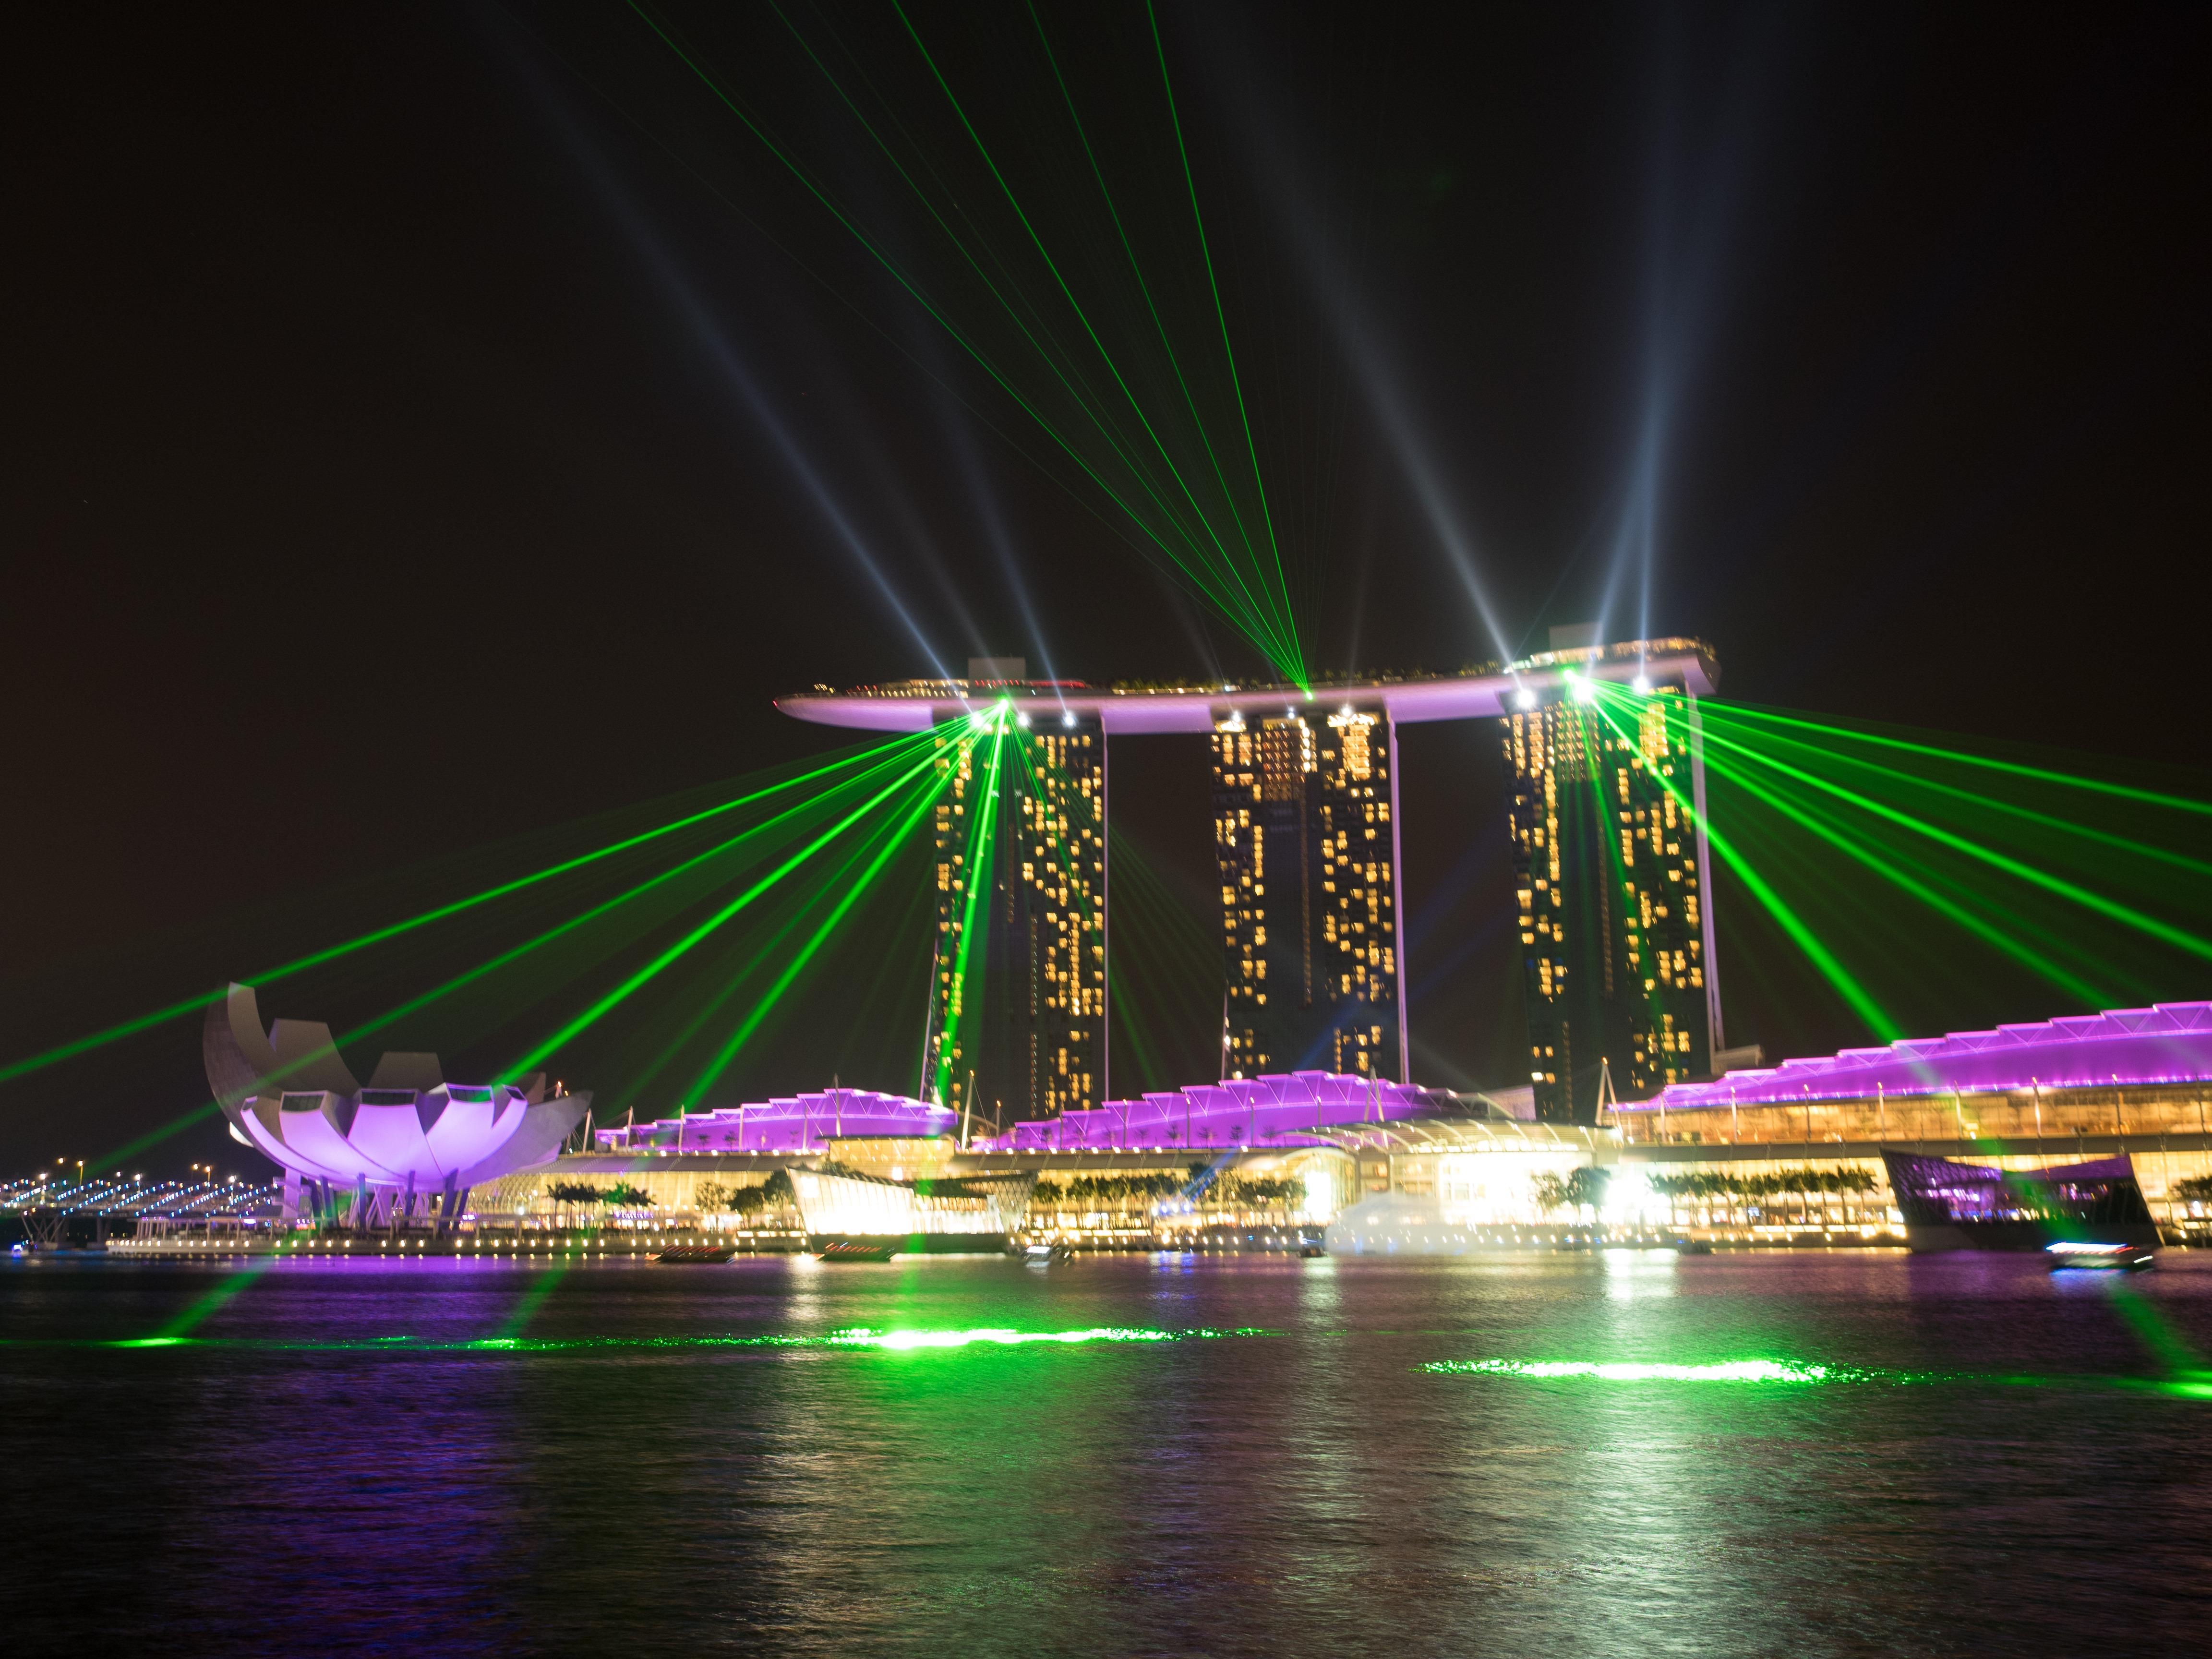 free images bridge night cityscape ferris wheel light show